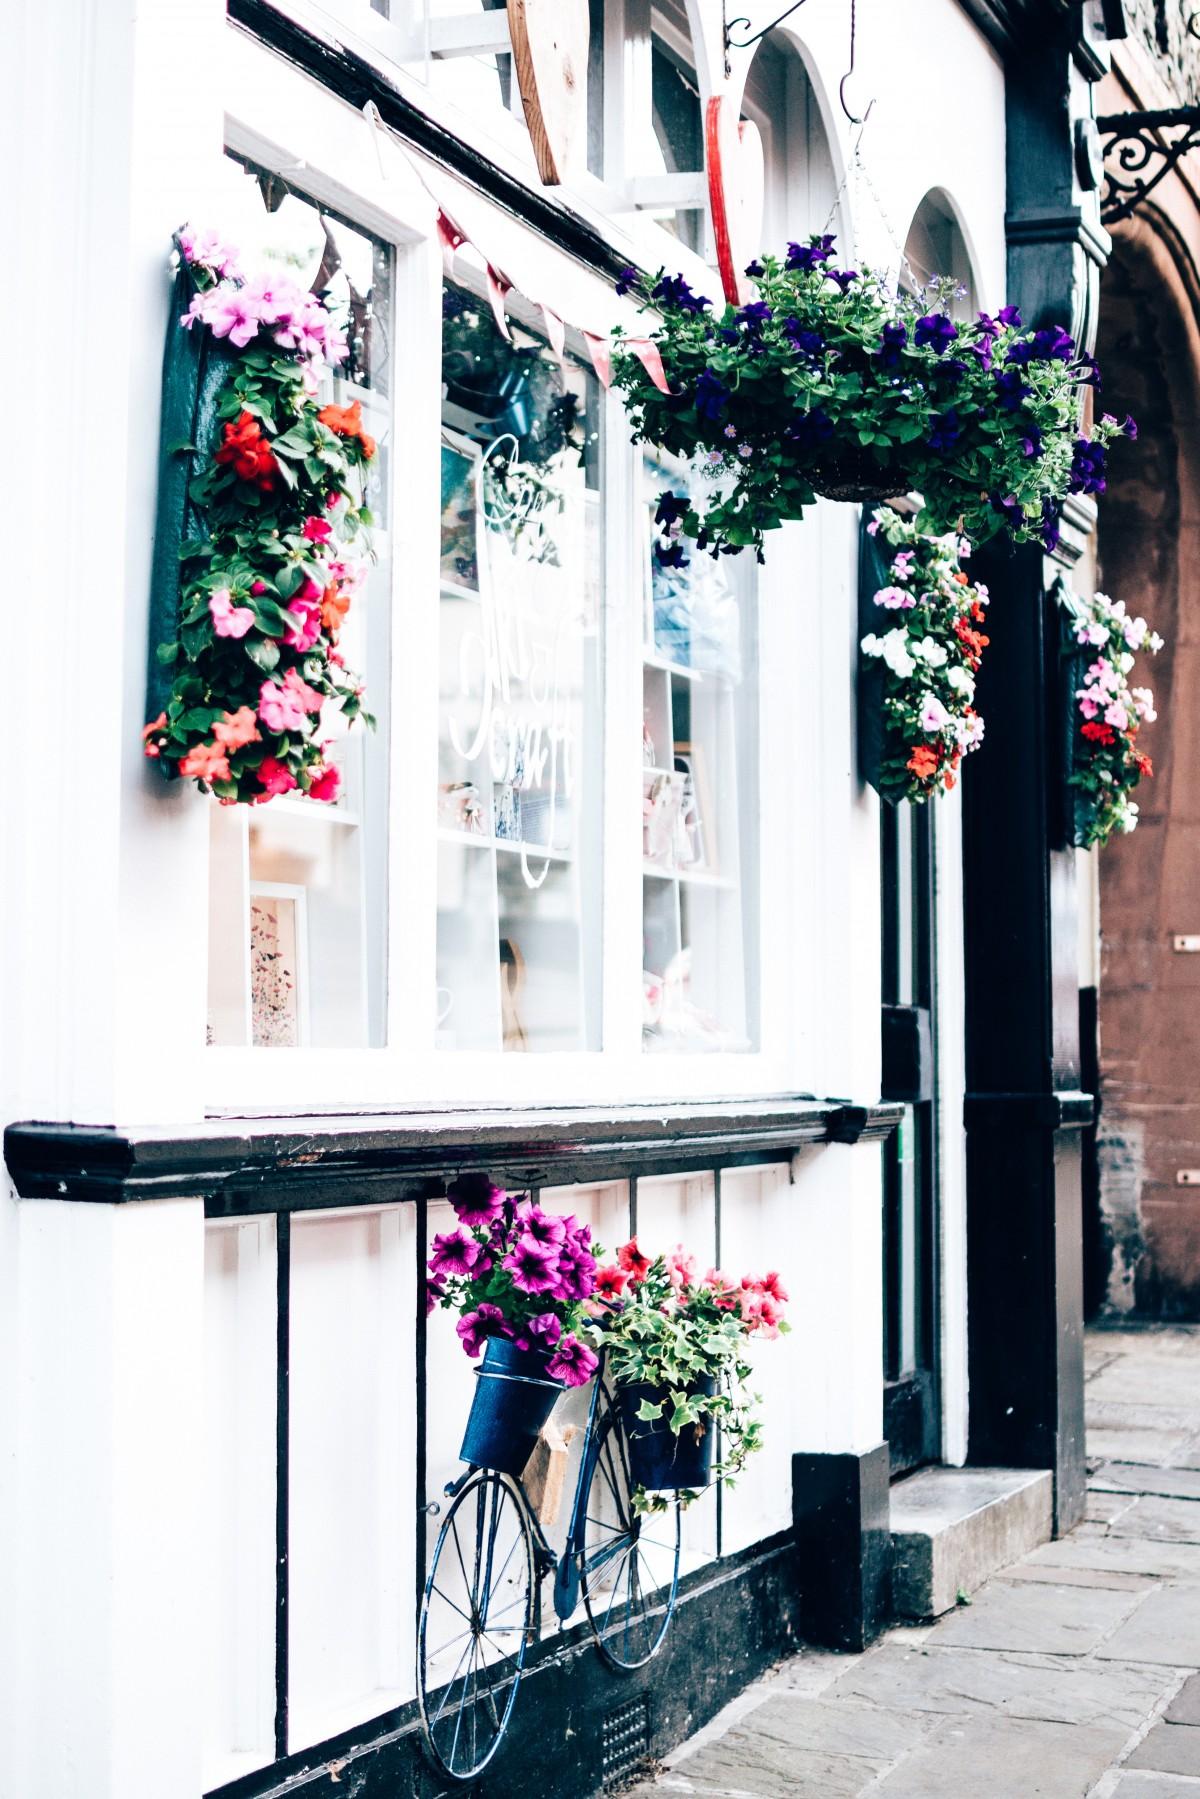 balcony_building_daylight_decoration_exterior_flowers_glass_windows_house-1517311